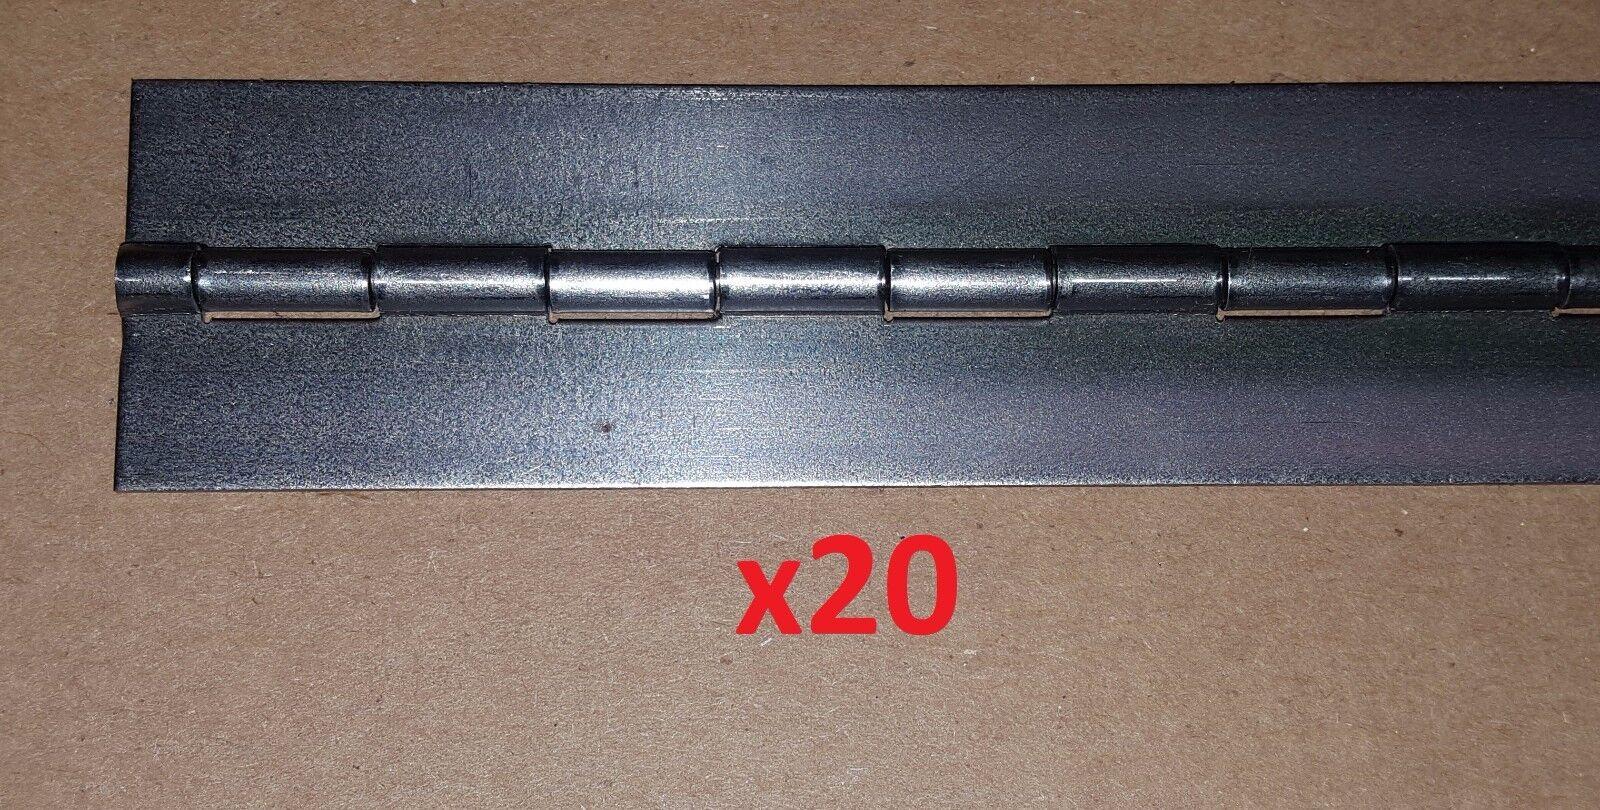 20 pc .050 Steel Piano Hinge 22-1 4 x 1-1 4 Cabinet Door Continuous Lot